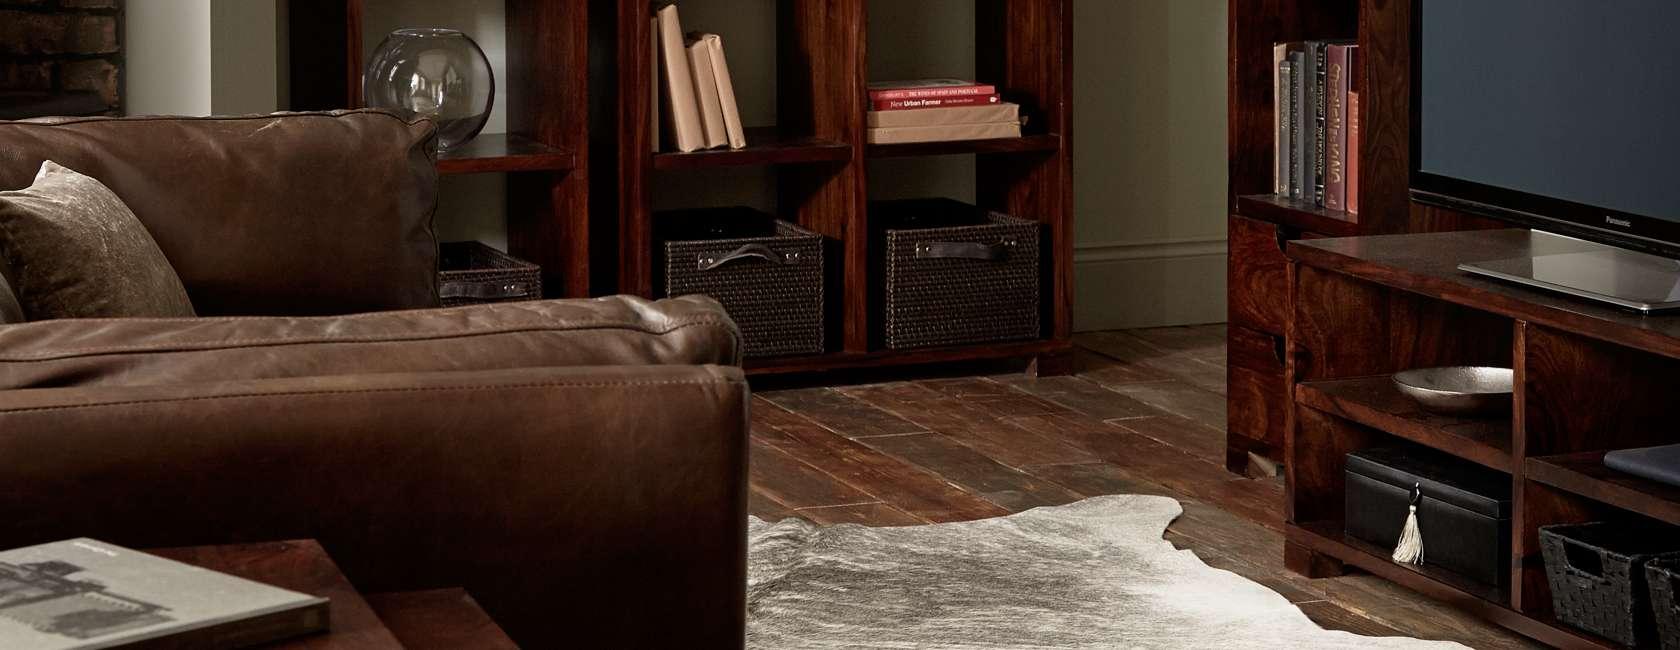 John lewis partners stowaway living room furniture ranges at john lewis partners for Living room furniture ranges